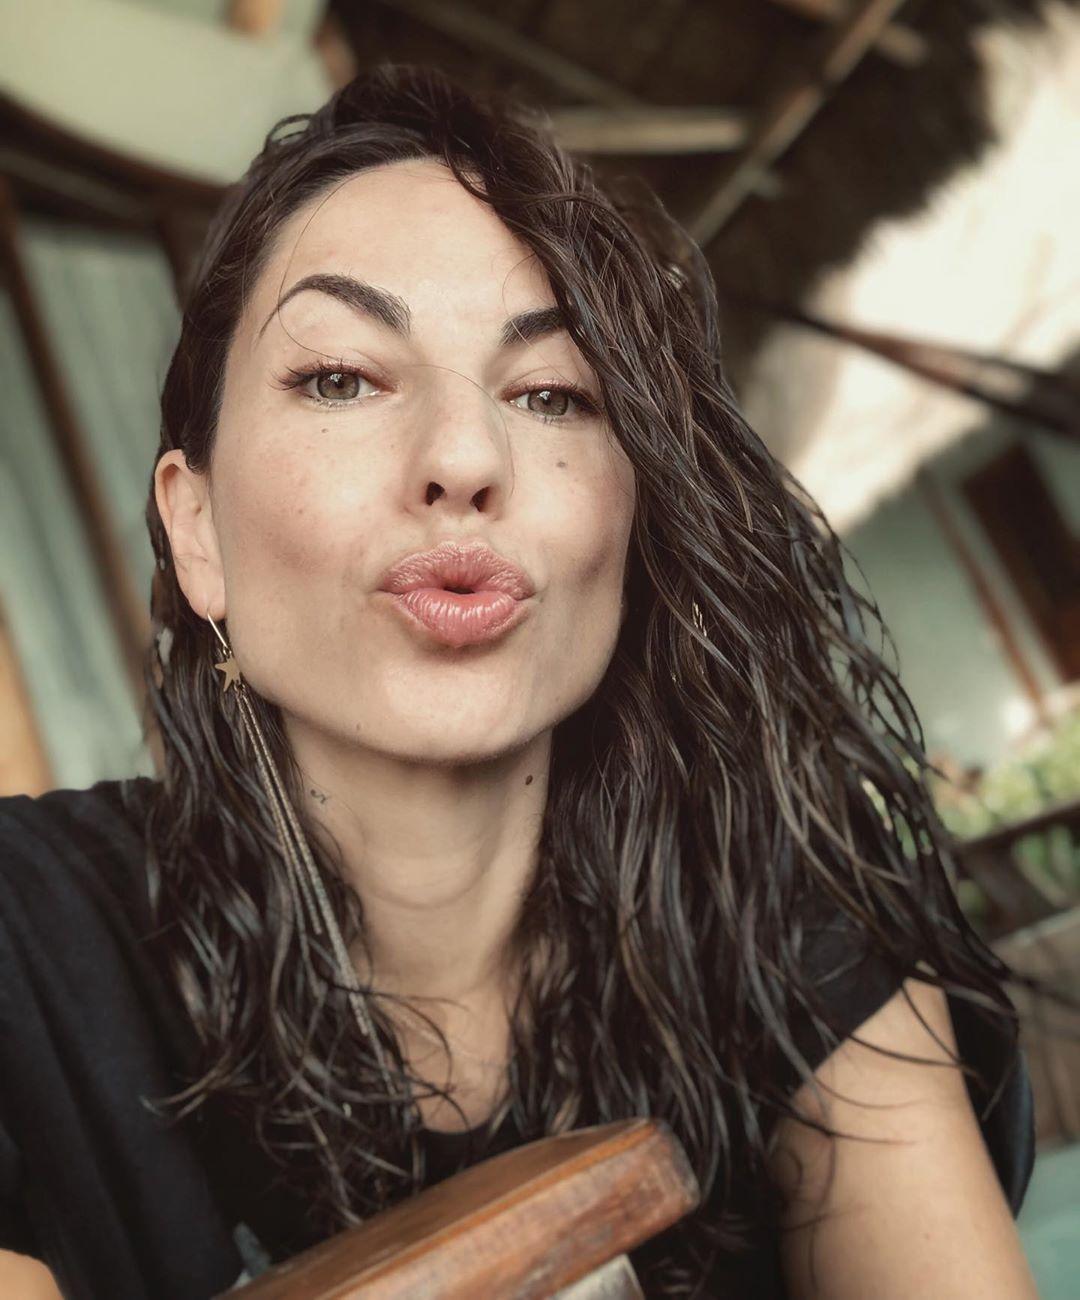 61 Sexy Pictures Of Barbara Mori Are A Genuine Masterpiece